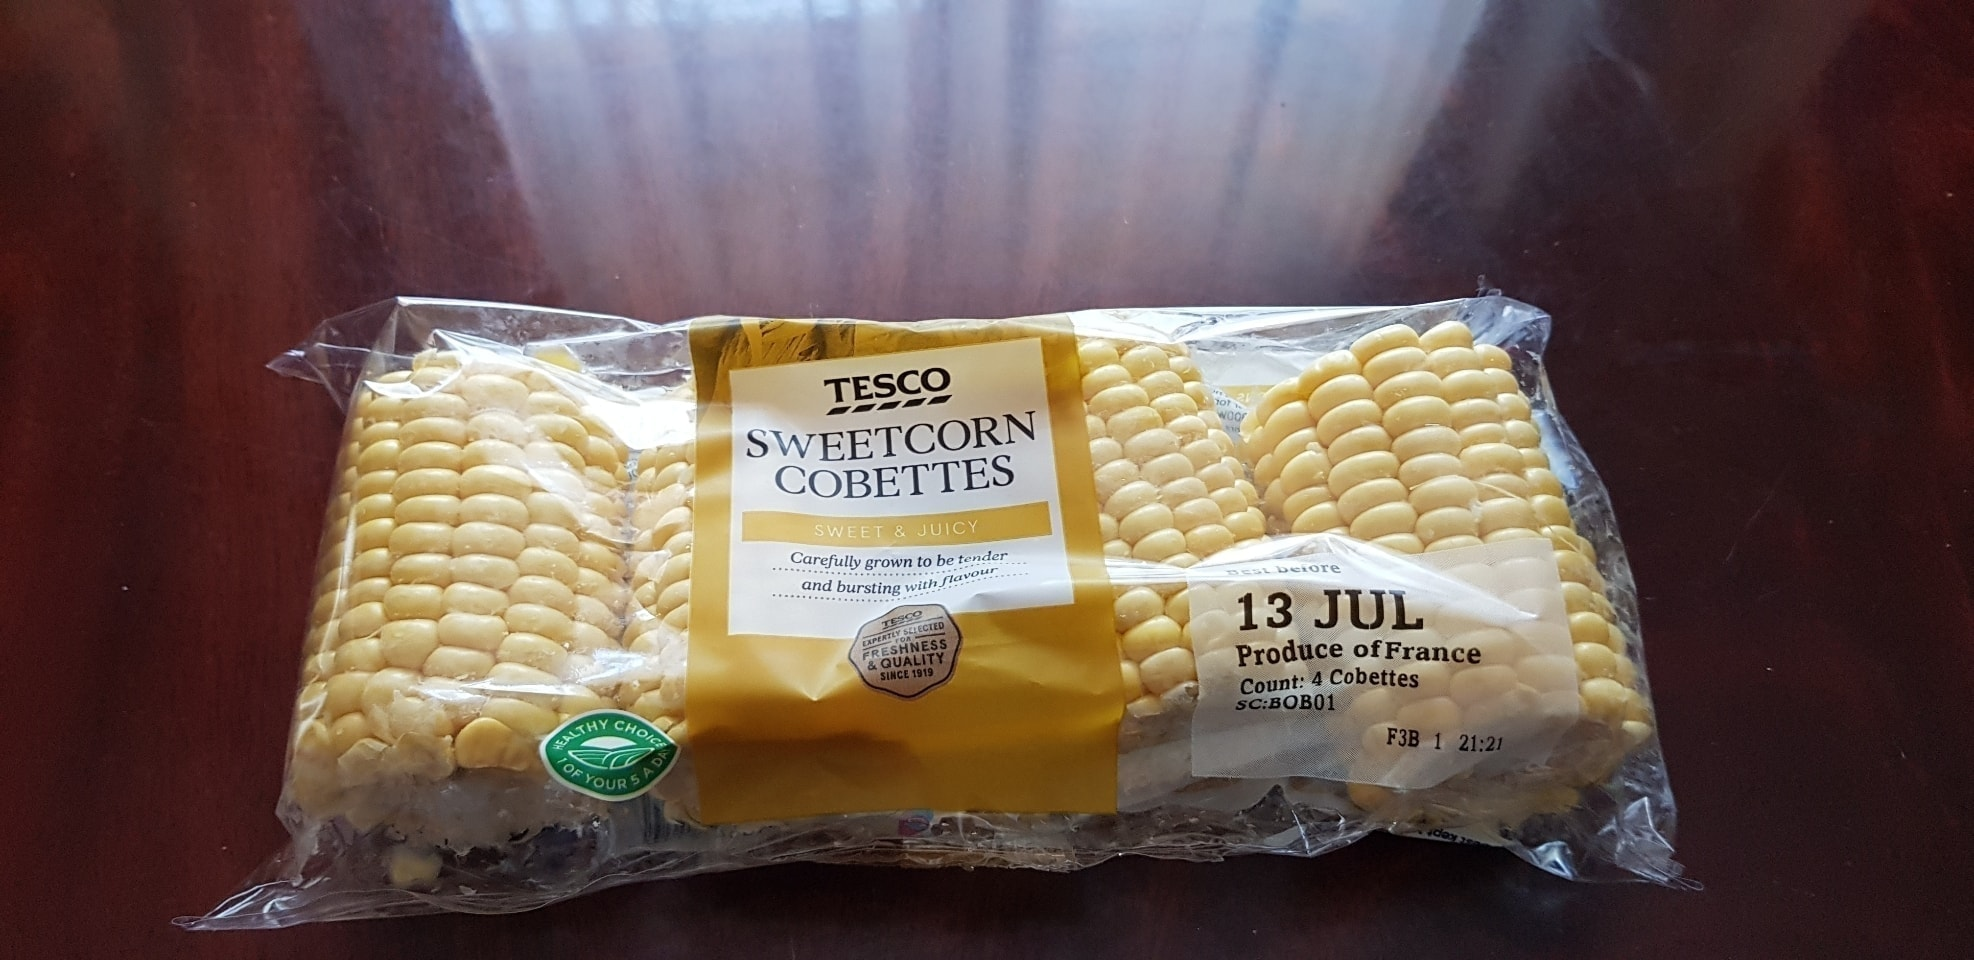 Sweetcorn cobettes